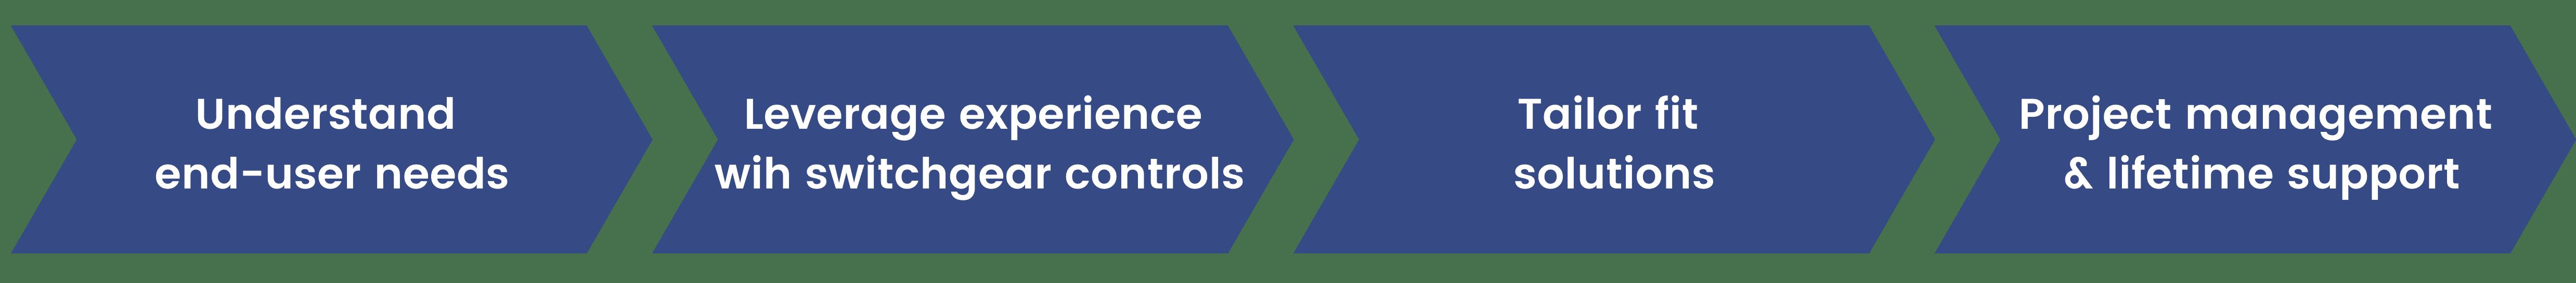 PEC Business Model